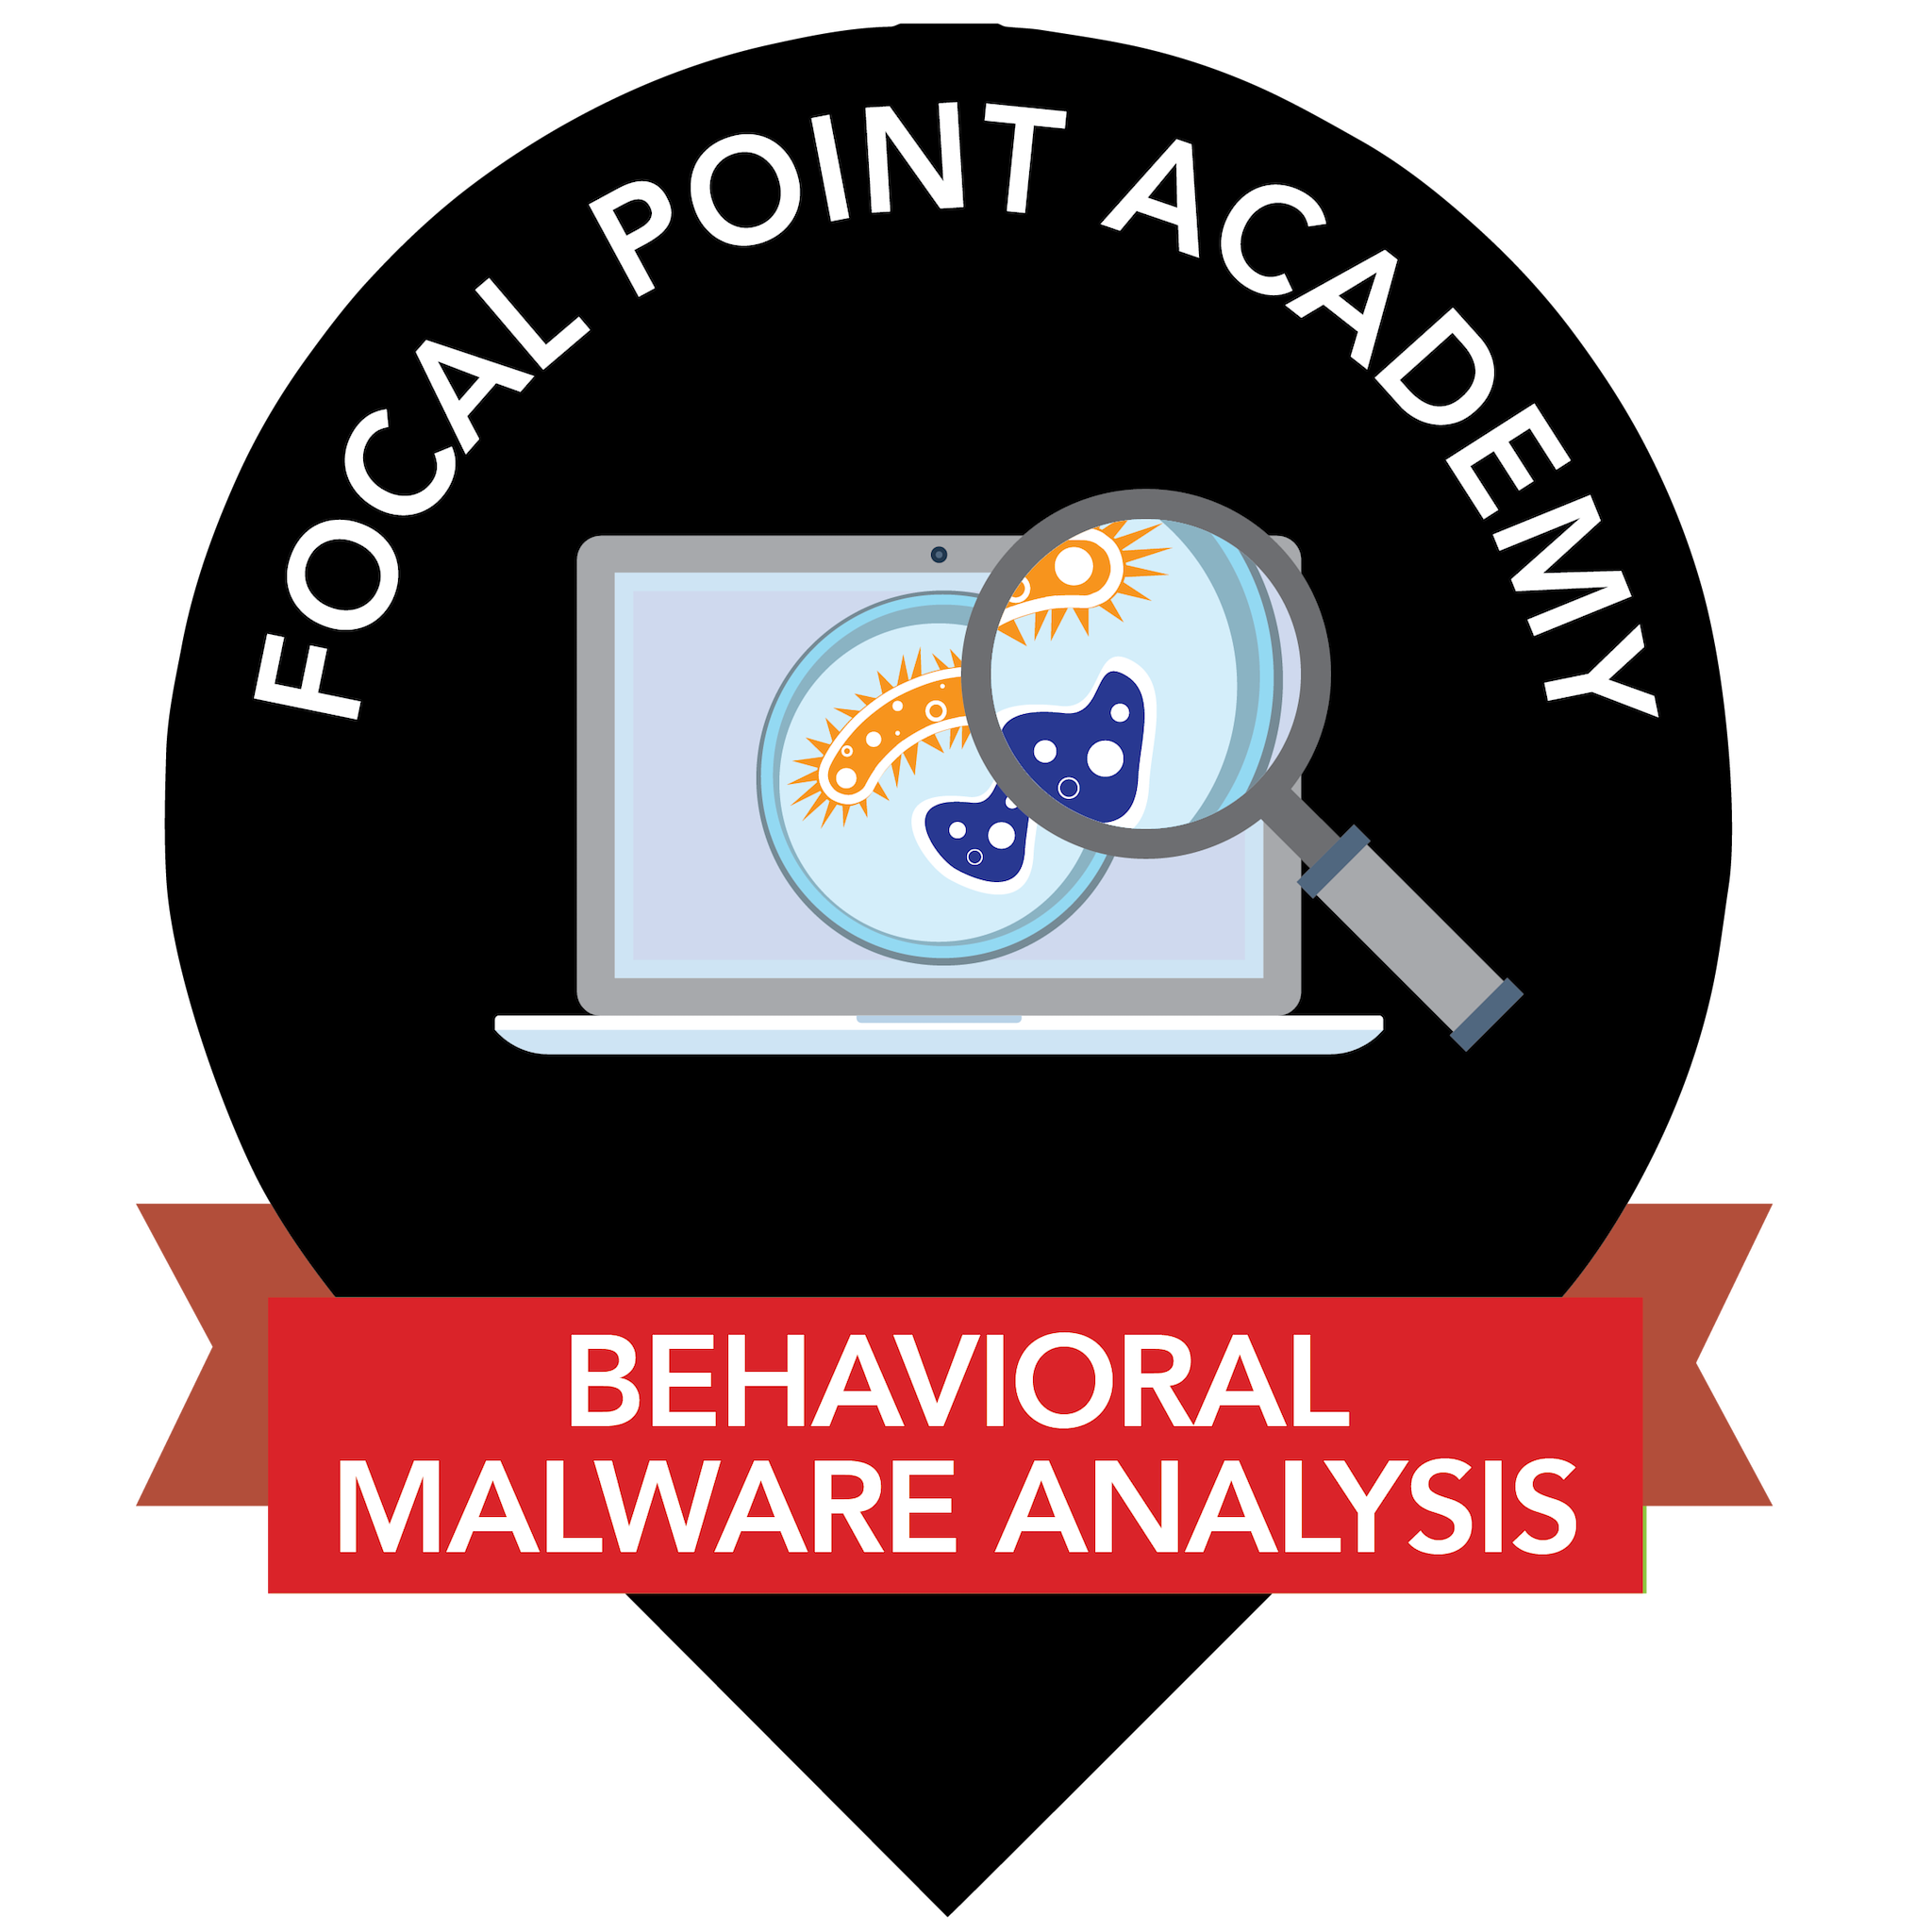 Behavioral Malware Analysis